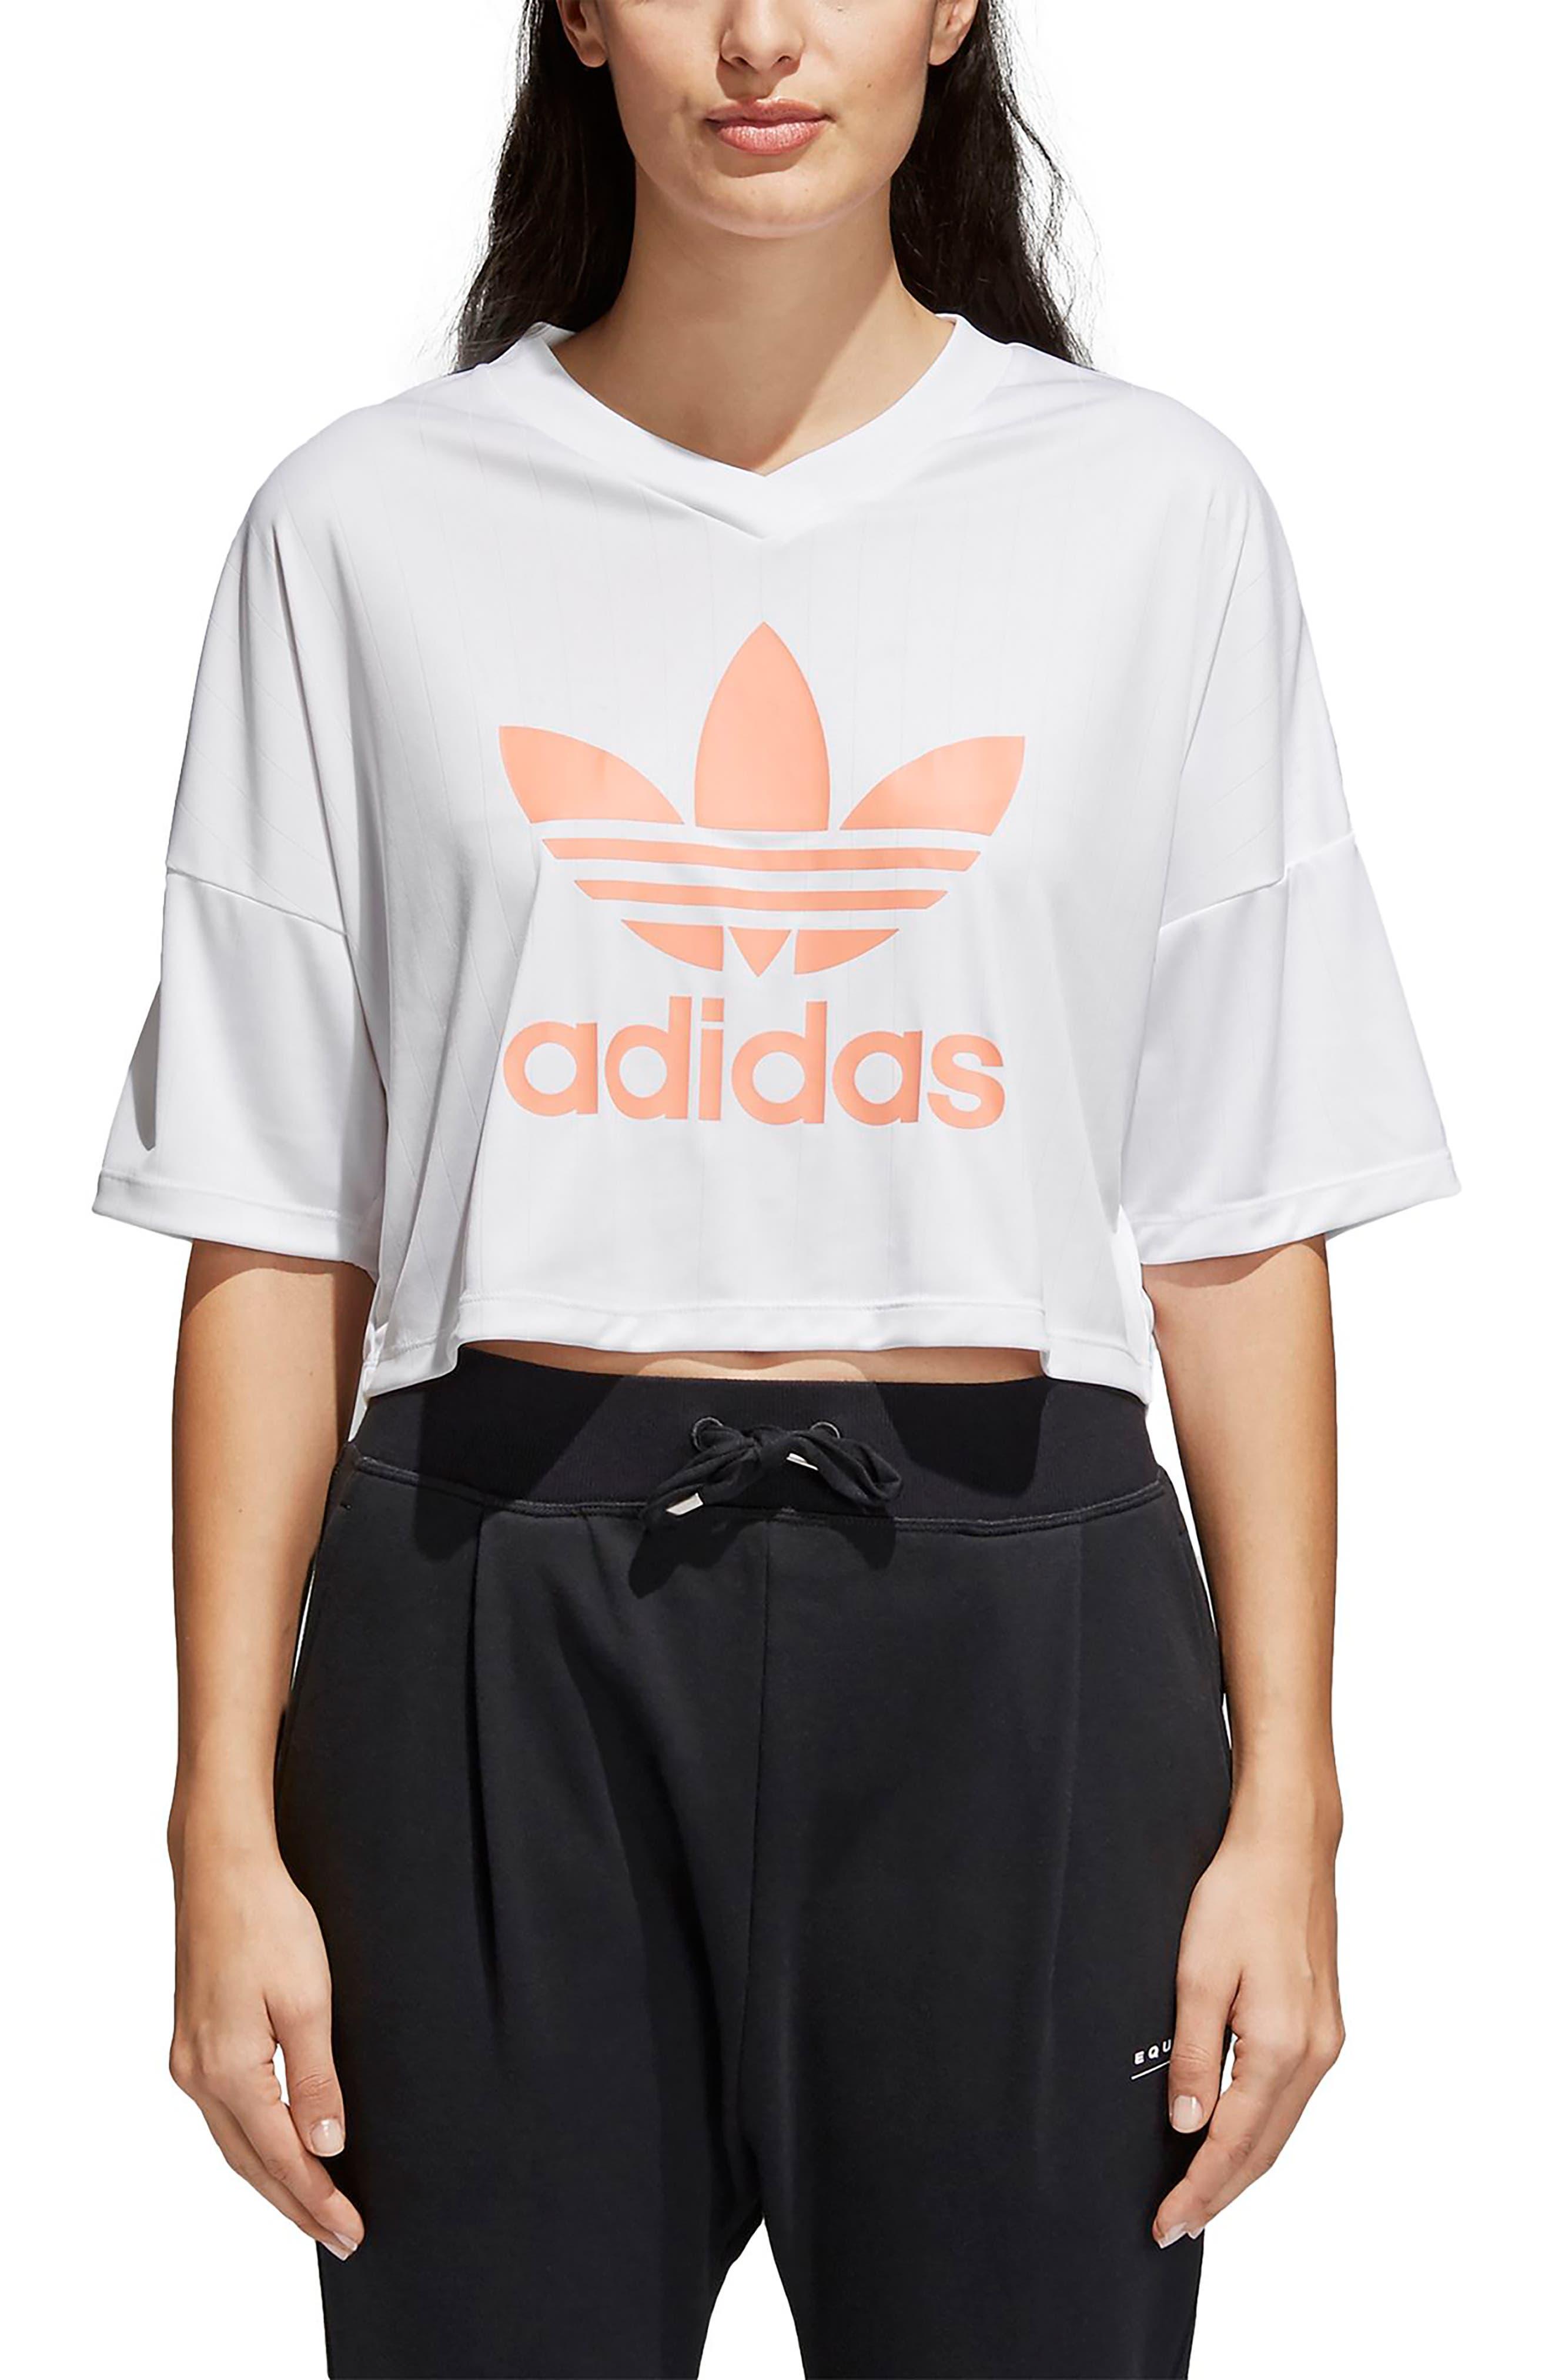 Alternate Image 1 Selected - adidas Originals Trefoil Crop Tee